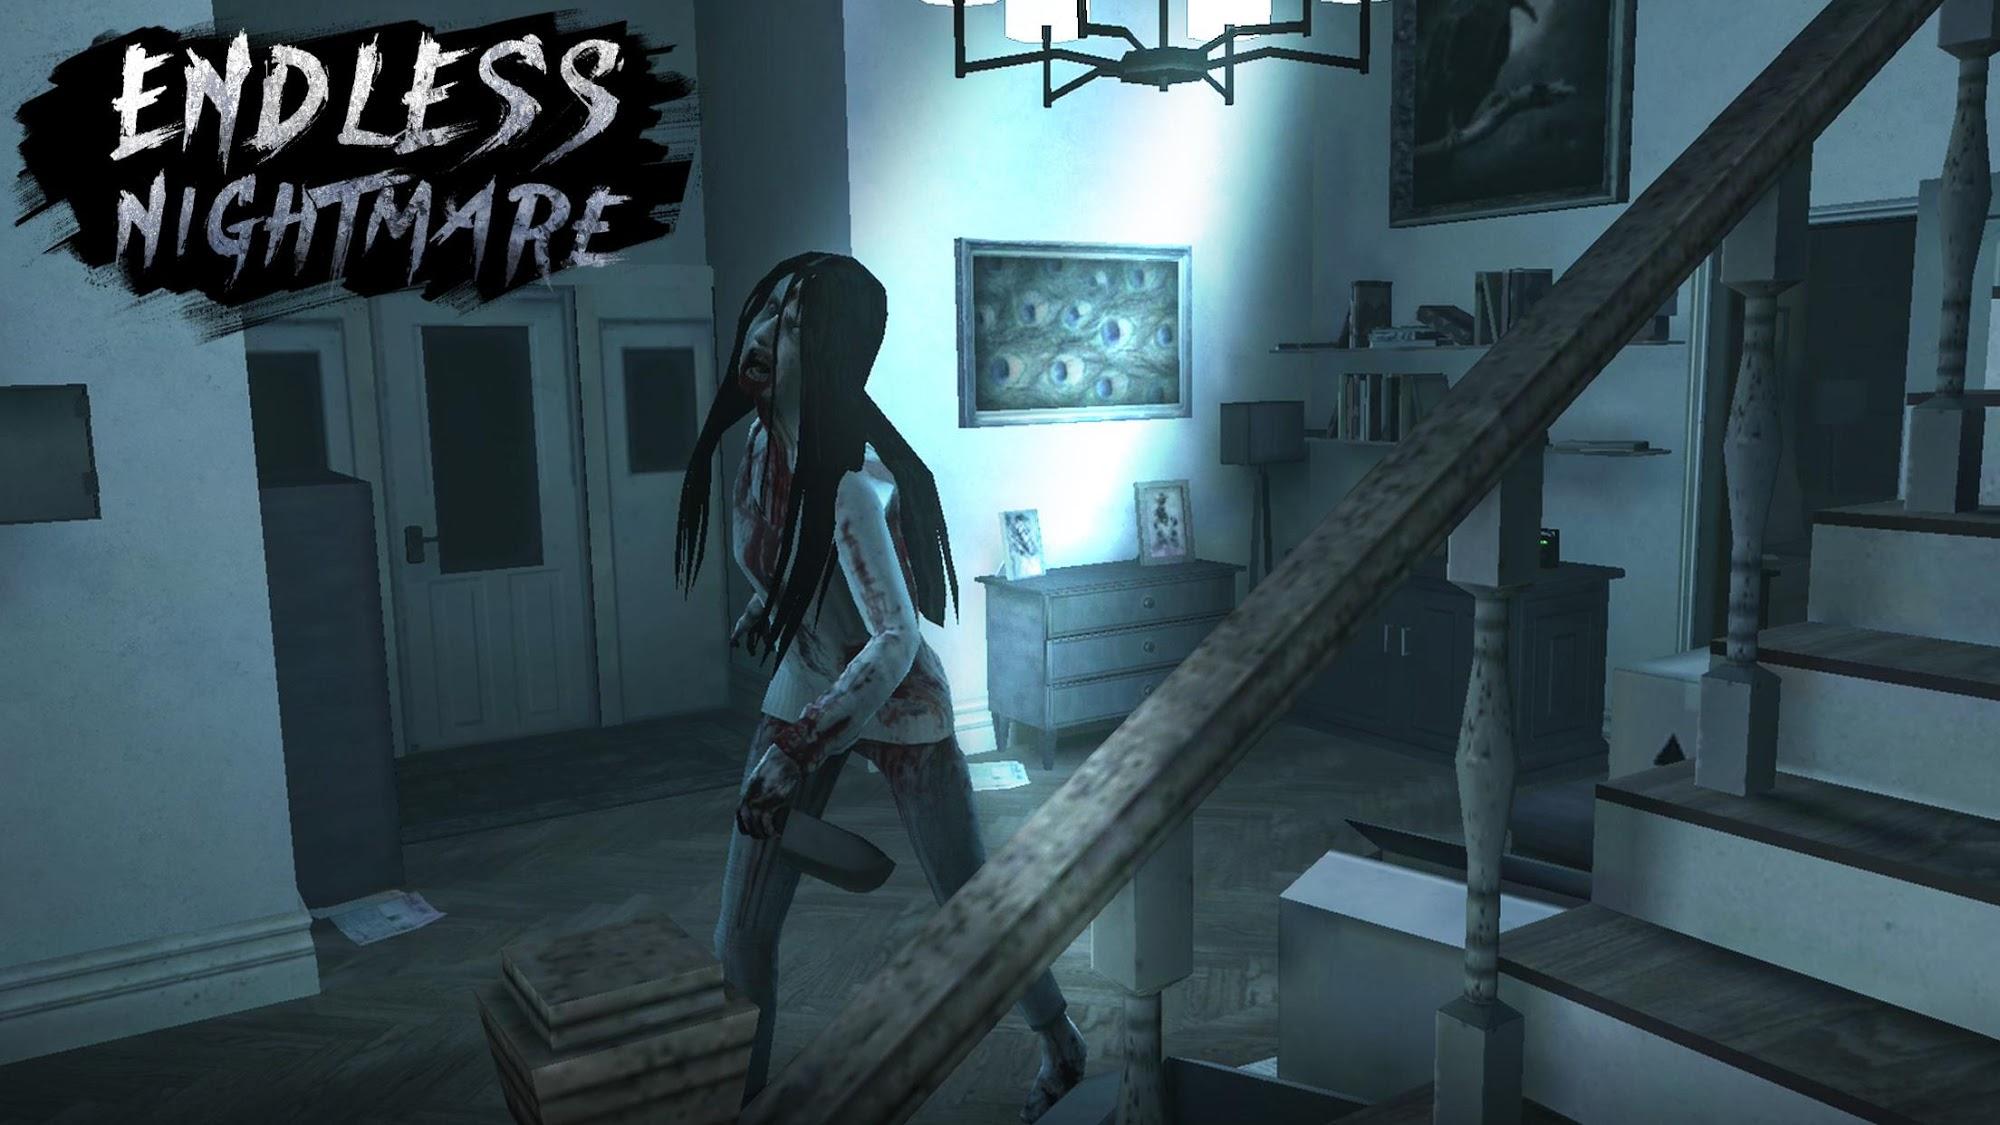 Endless Nightmare: 3D Creepy & Scary Horror Game скріншот 1